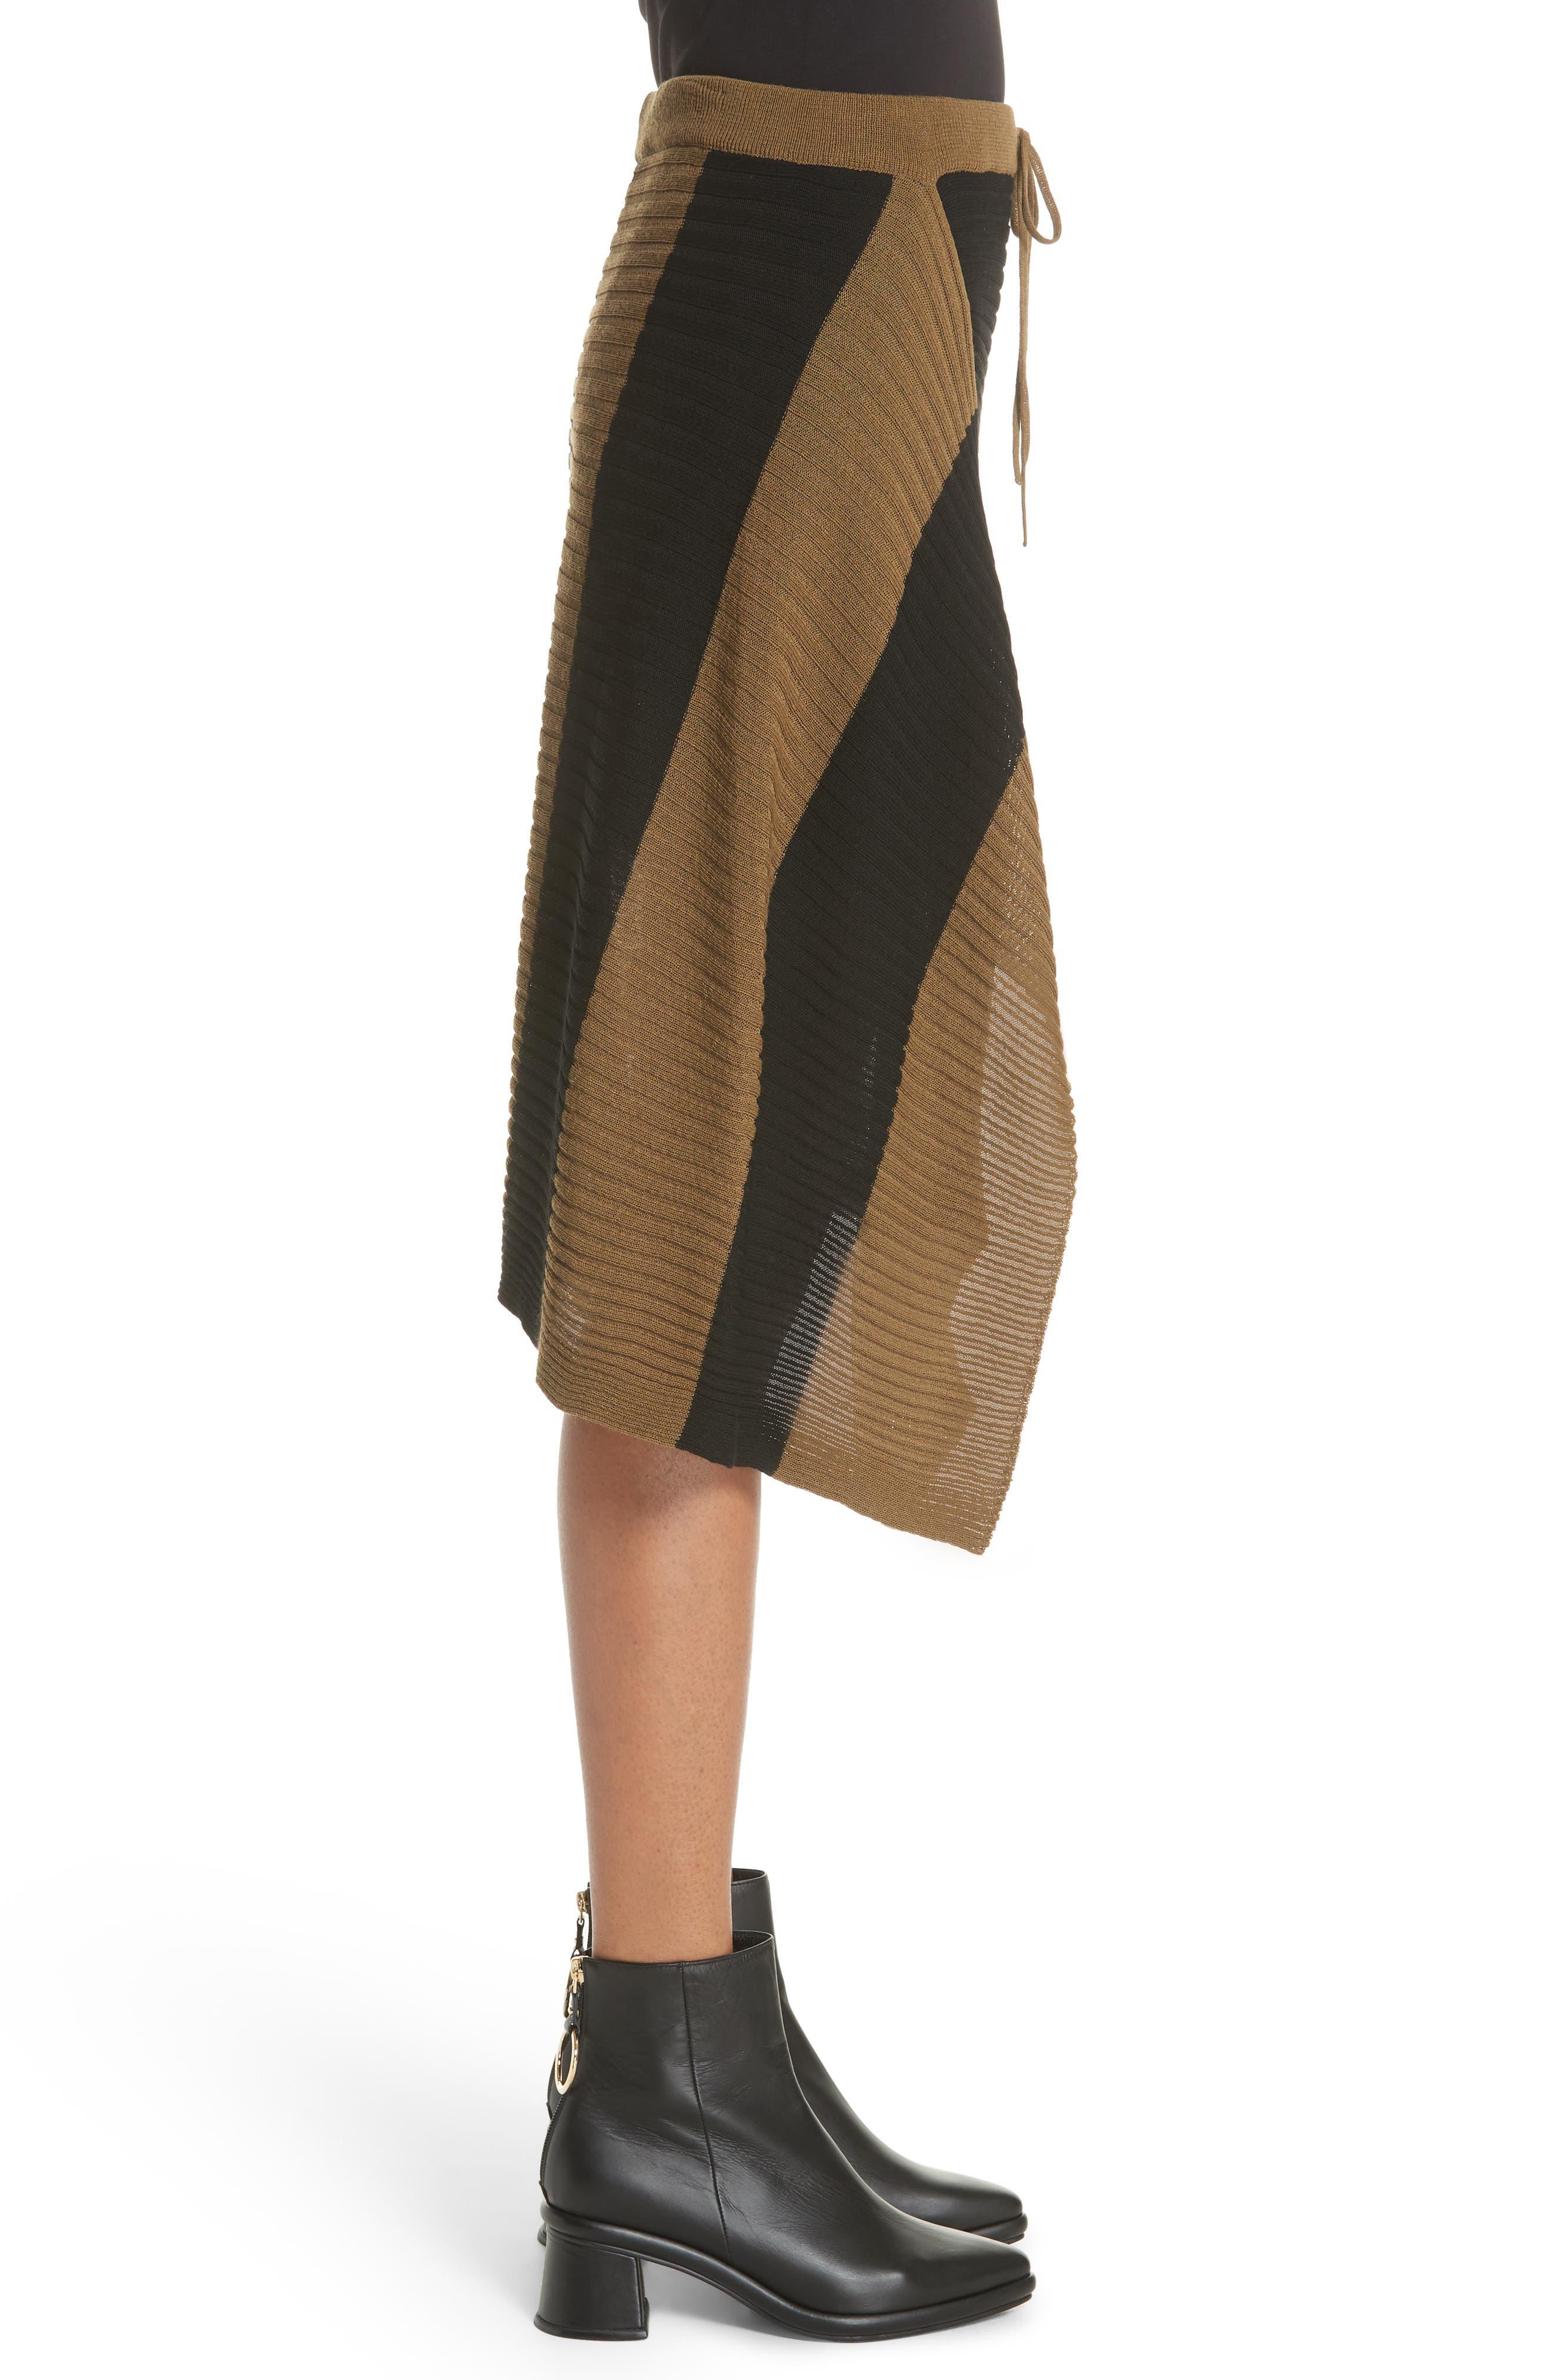 Marques'Almeida Draped Skirt,                             Alternate thumbnail 3, color,                             200